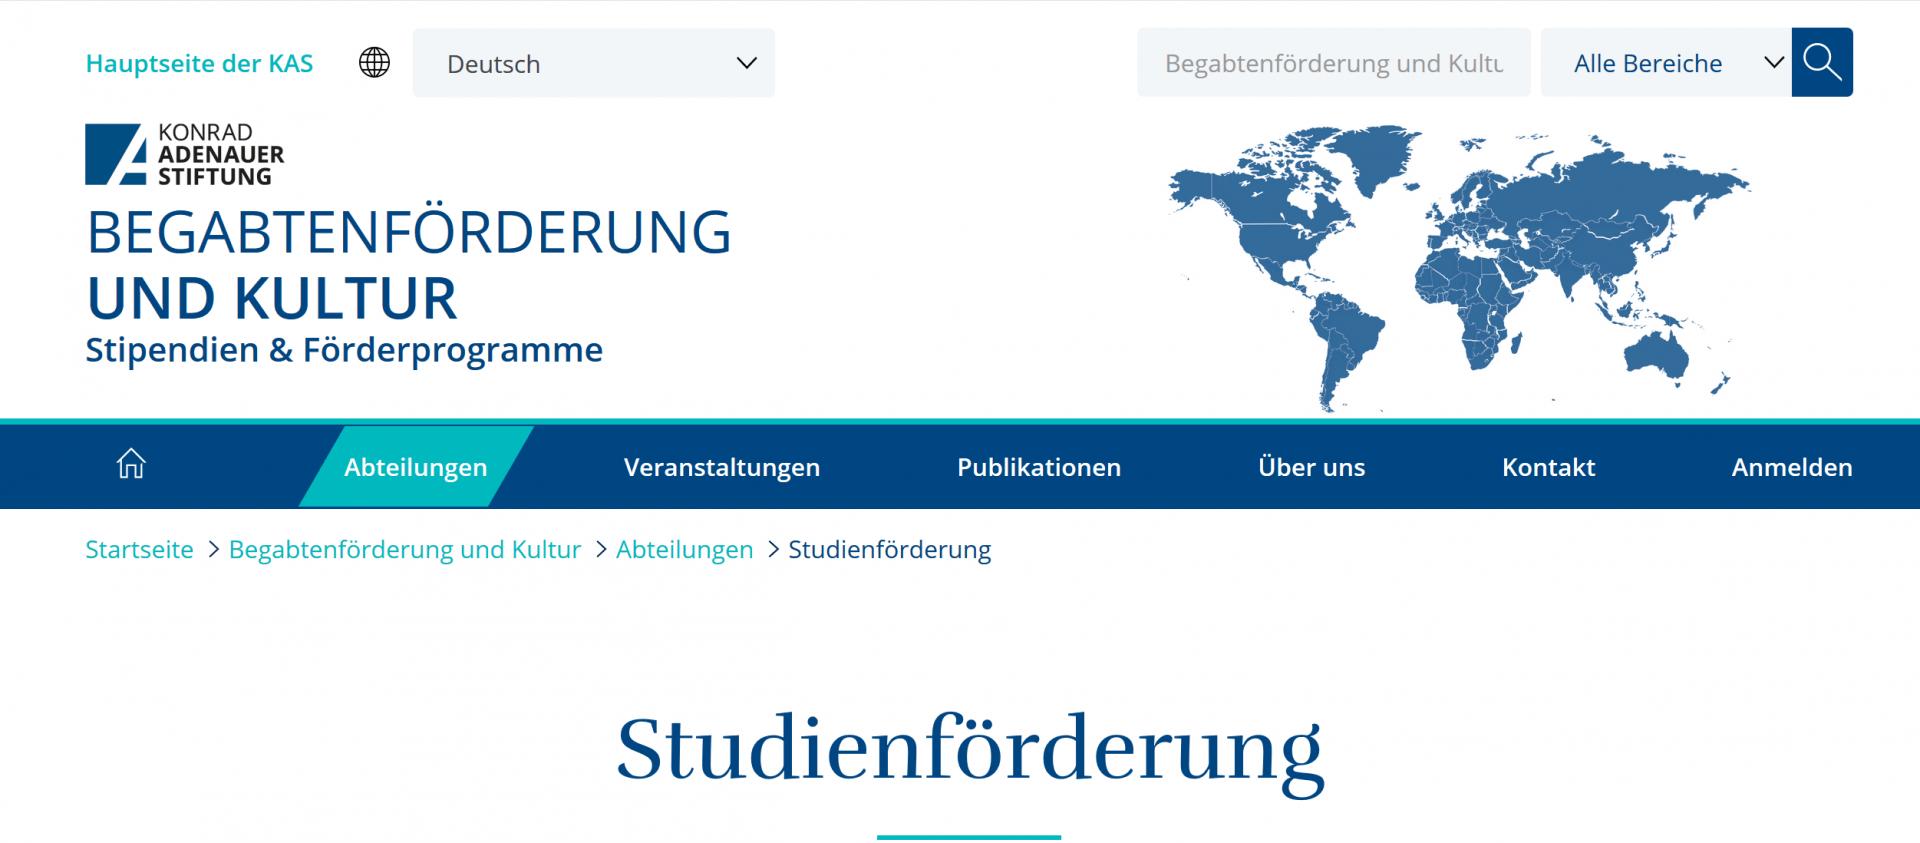 Professorial mentor for Konrad-Adenauer-Foundation scholarship holders studying in Denmark